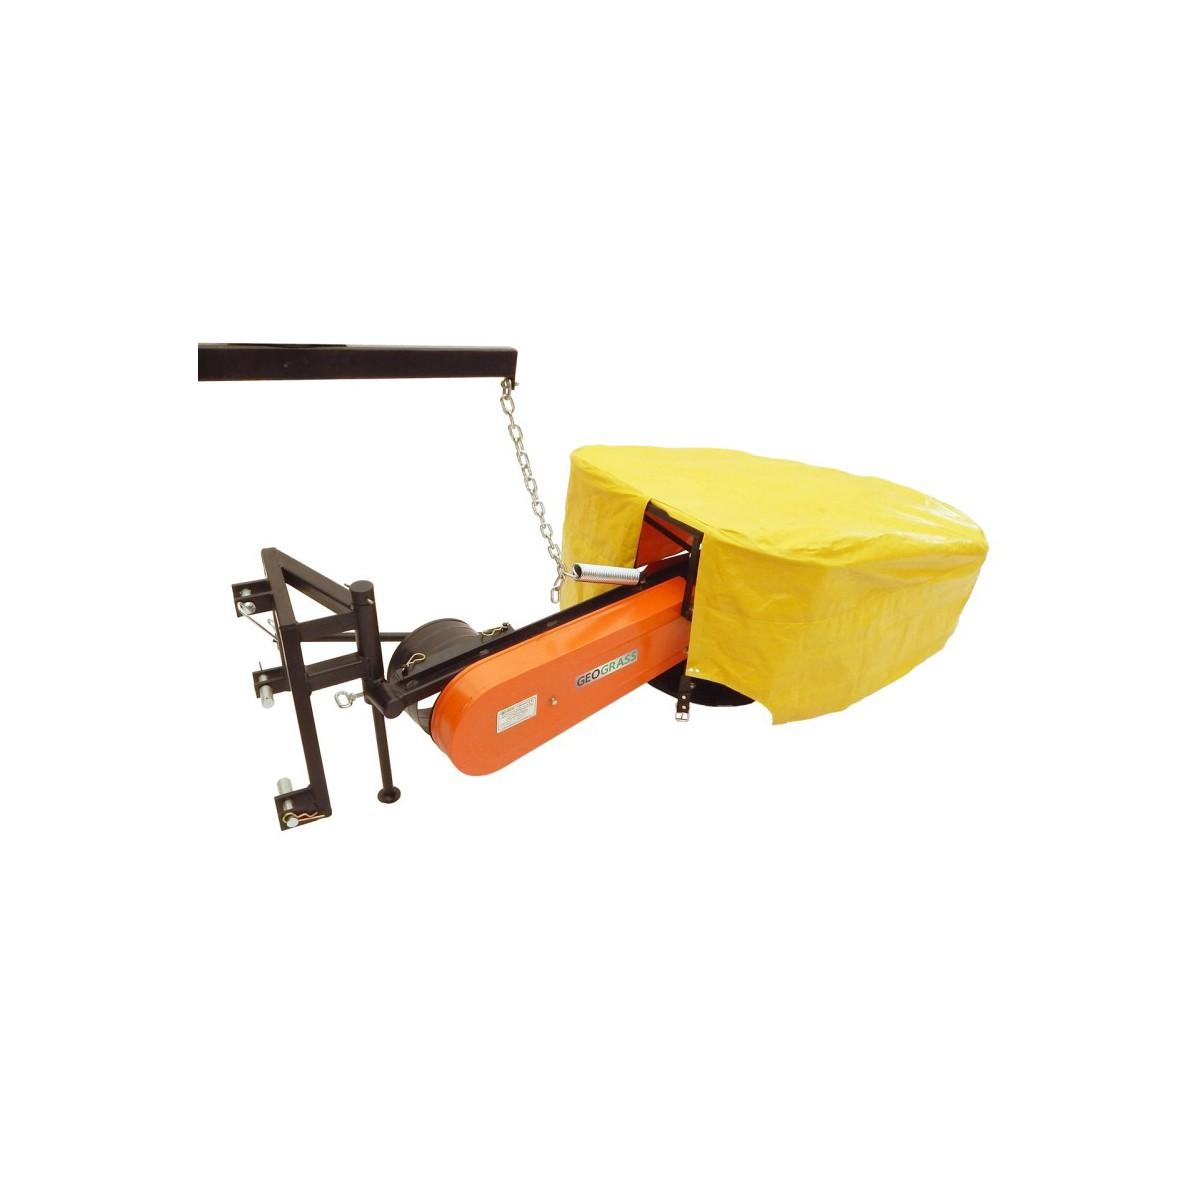 Rotary mower mini RDS 120 Geograss